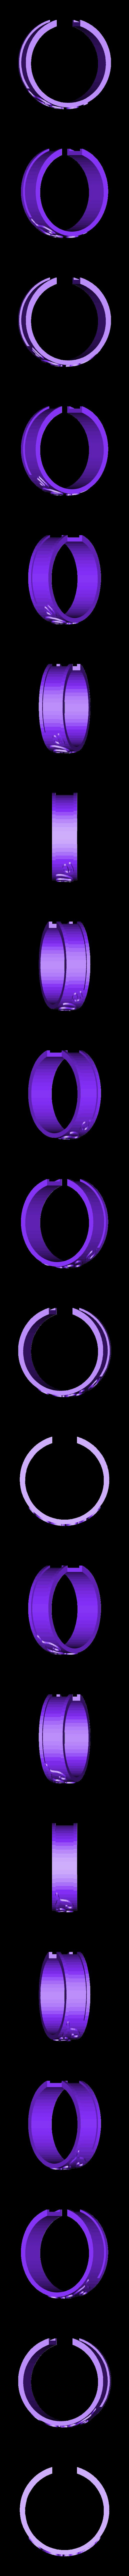 anillo love 22 abierto hendidura 2.stl Télécharger fichier STL gratuit Anillo / Ring Love • Design pour impression 3D, amg3D